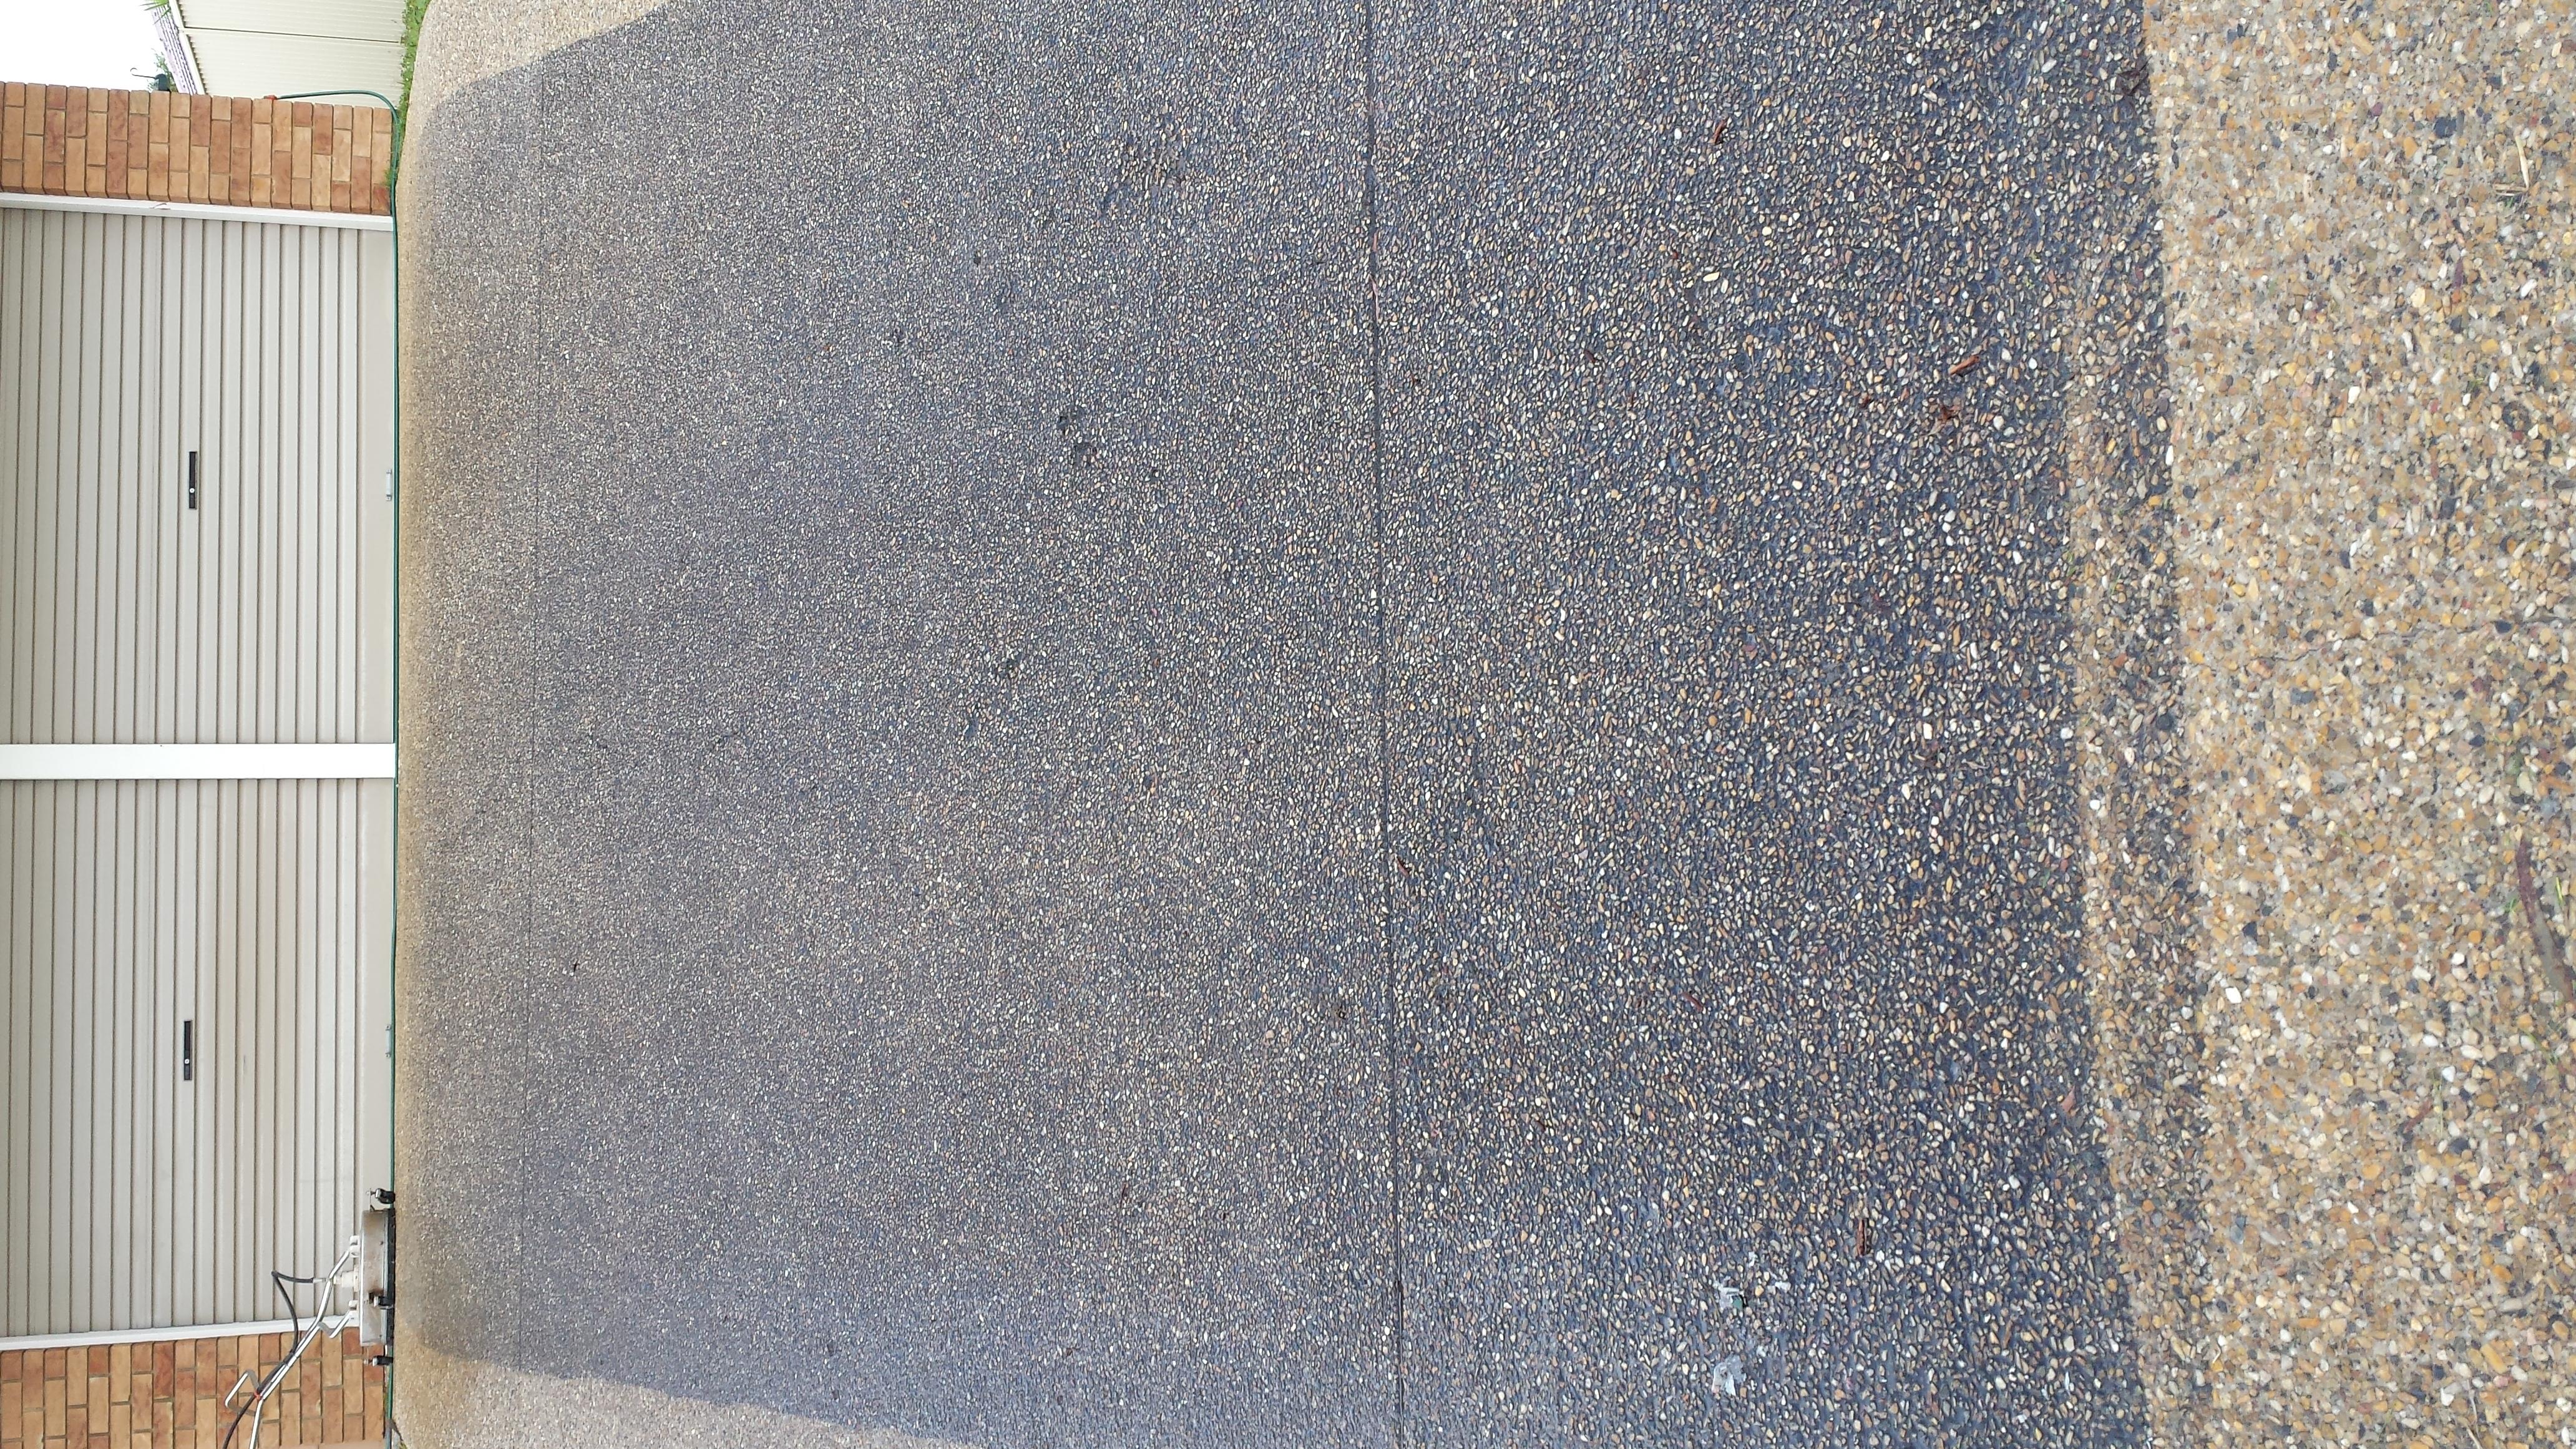 Before Sunshine Coast driveway cleaning